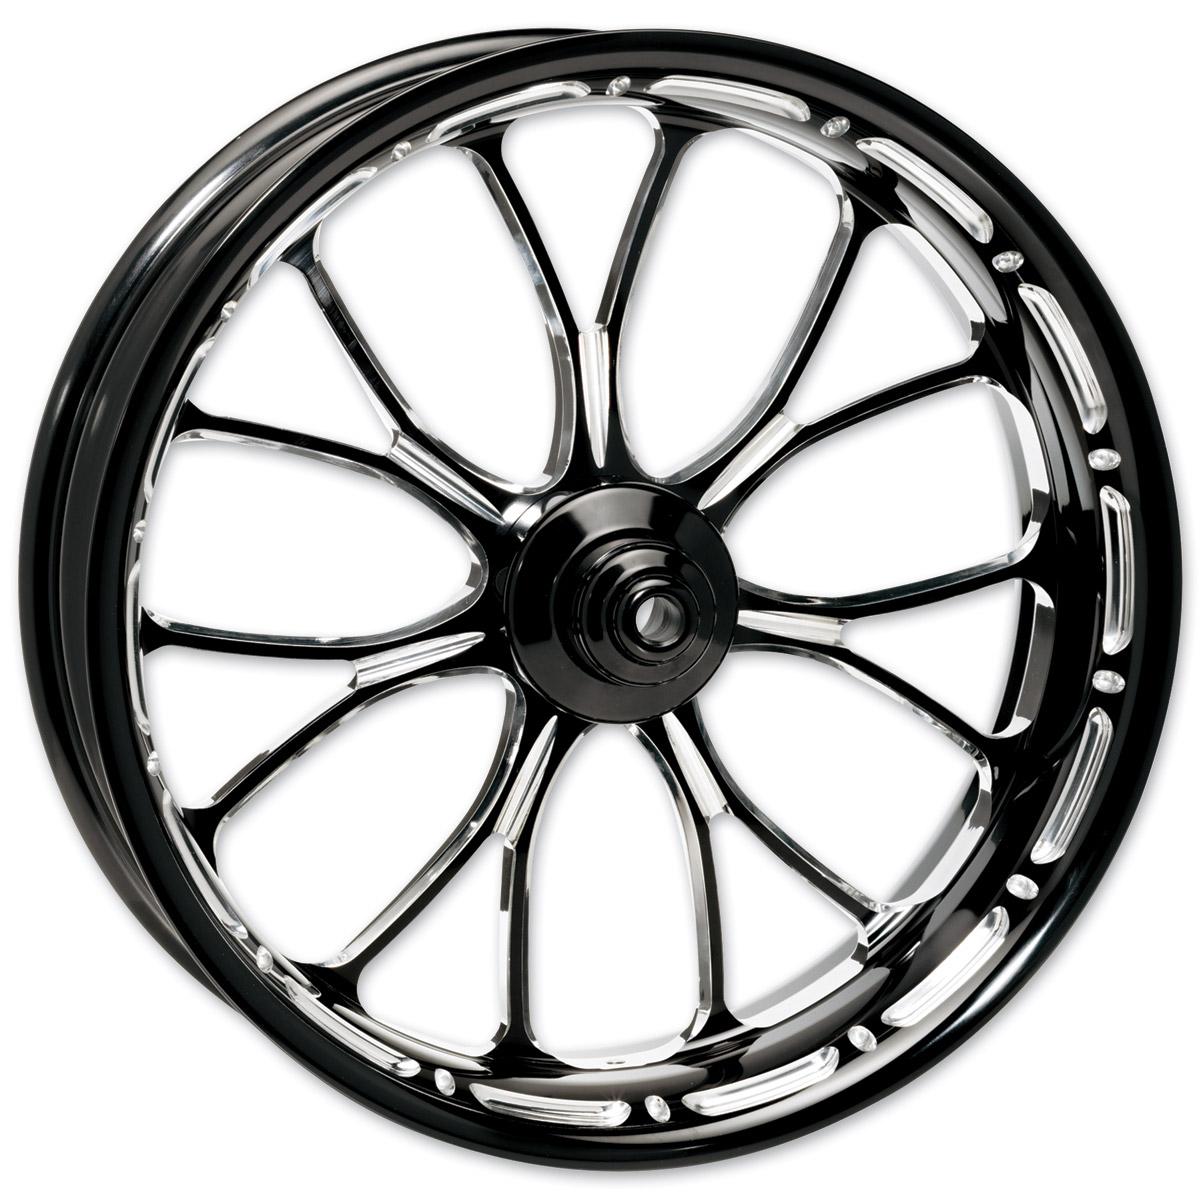 Performance Machine Heathen Front Wheel 21″ X 2.15″ Contrast Cut Platinum